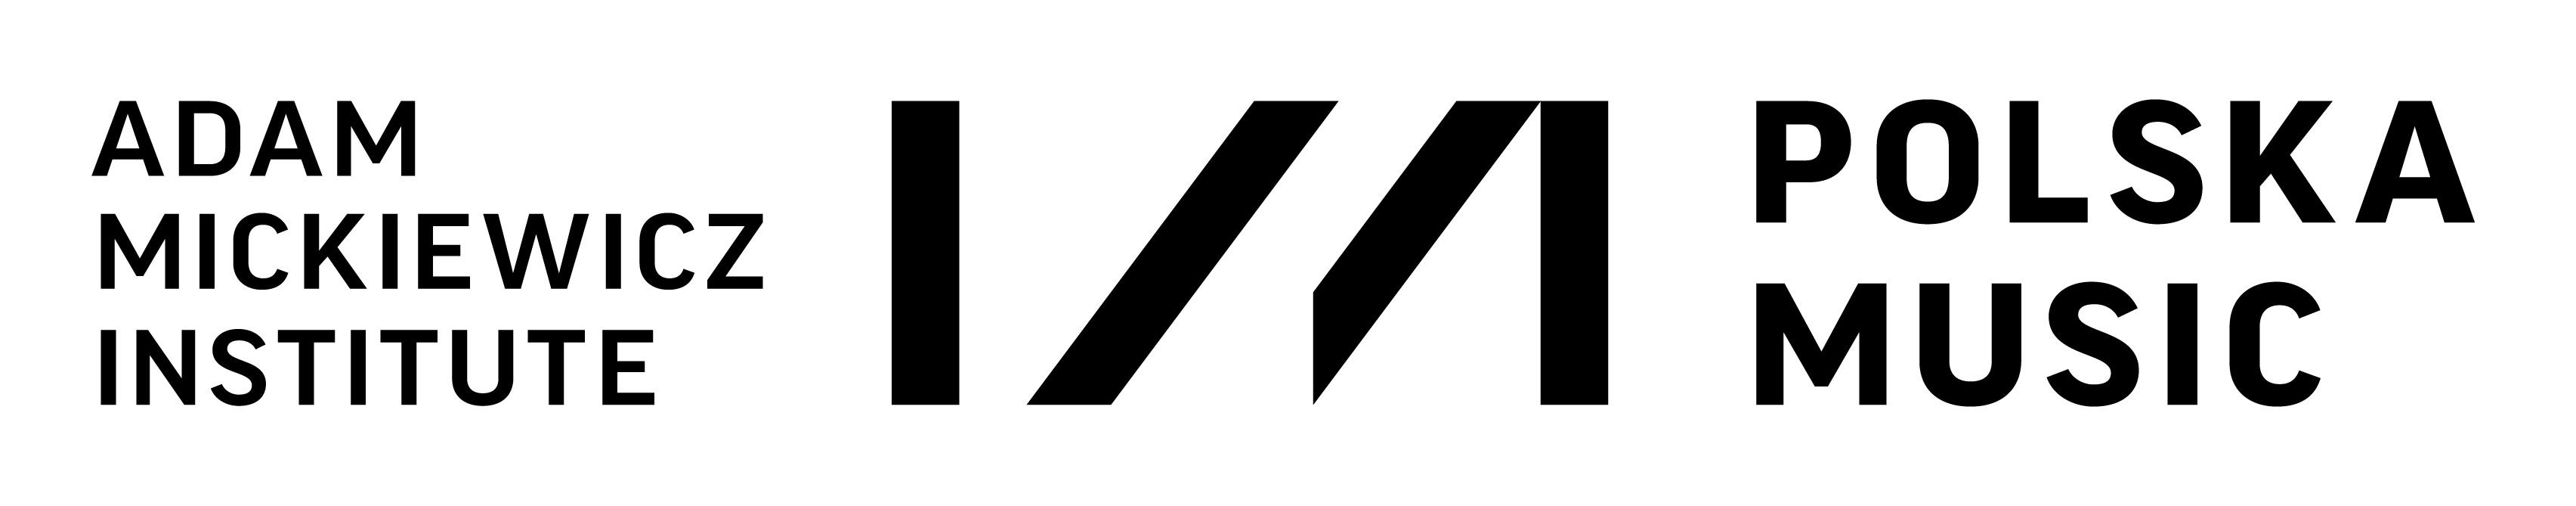 Adam Mickiewicz Institute - Polska Music programme logo